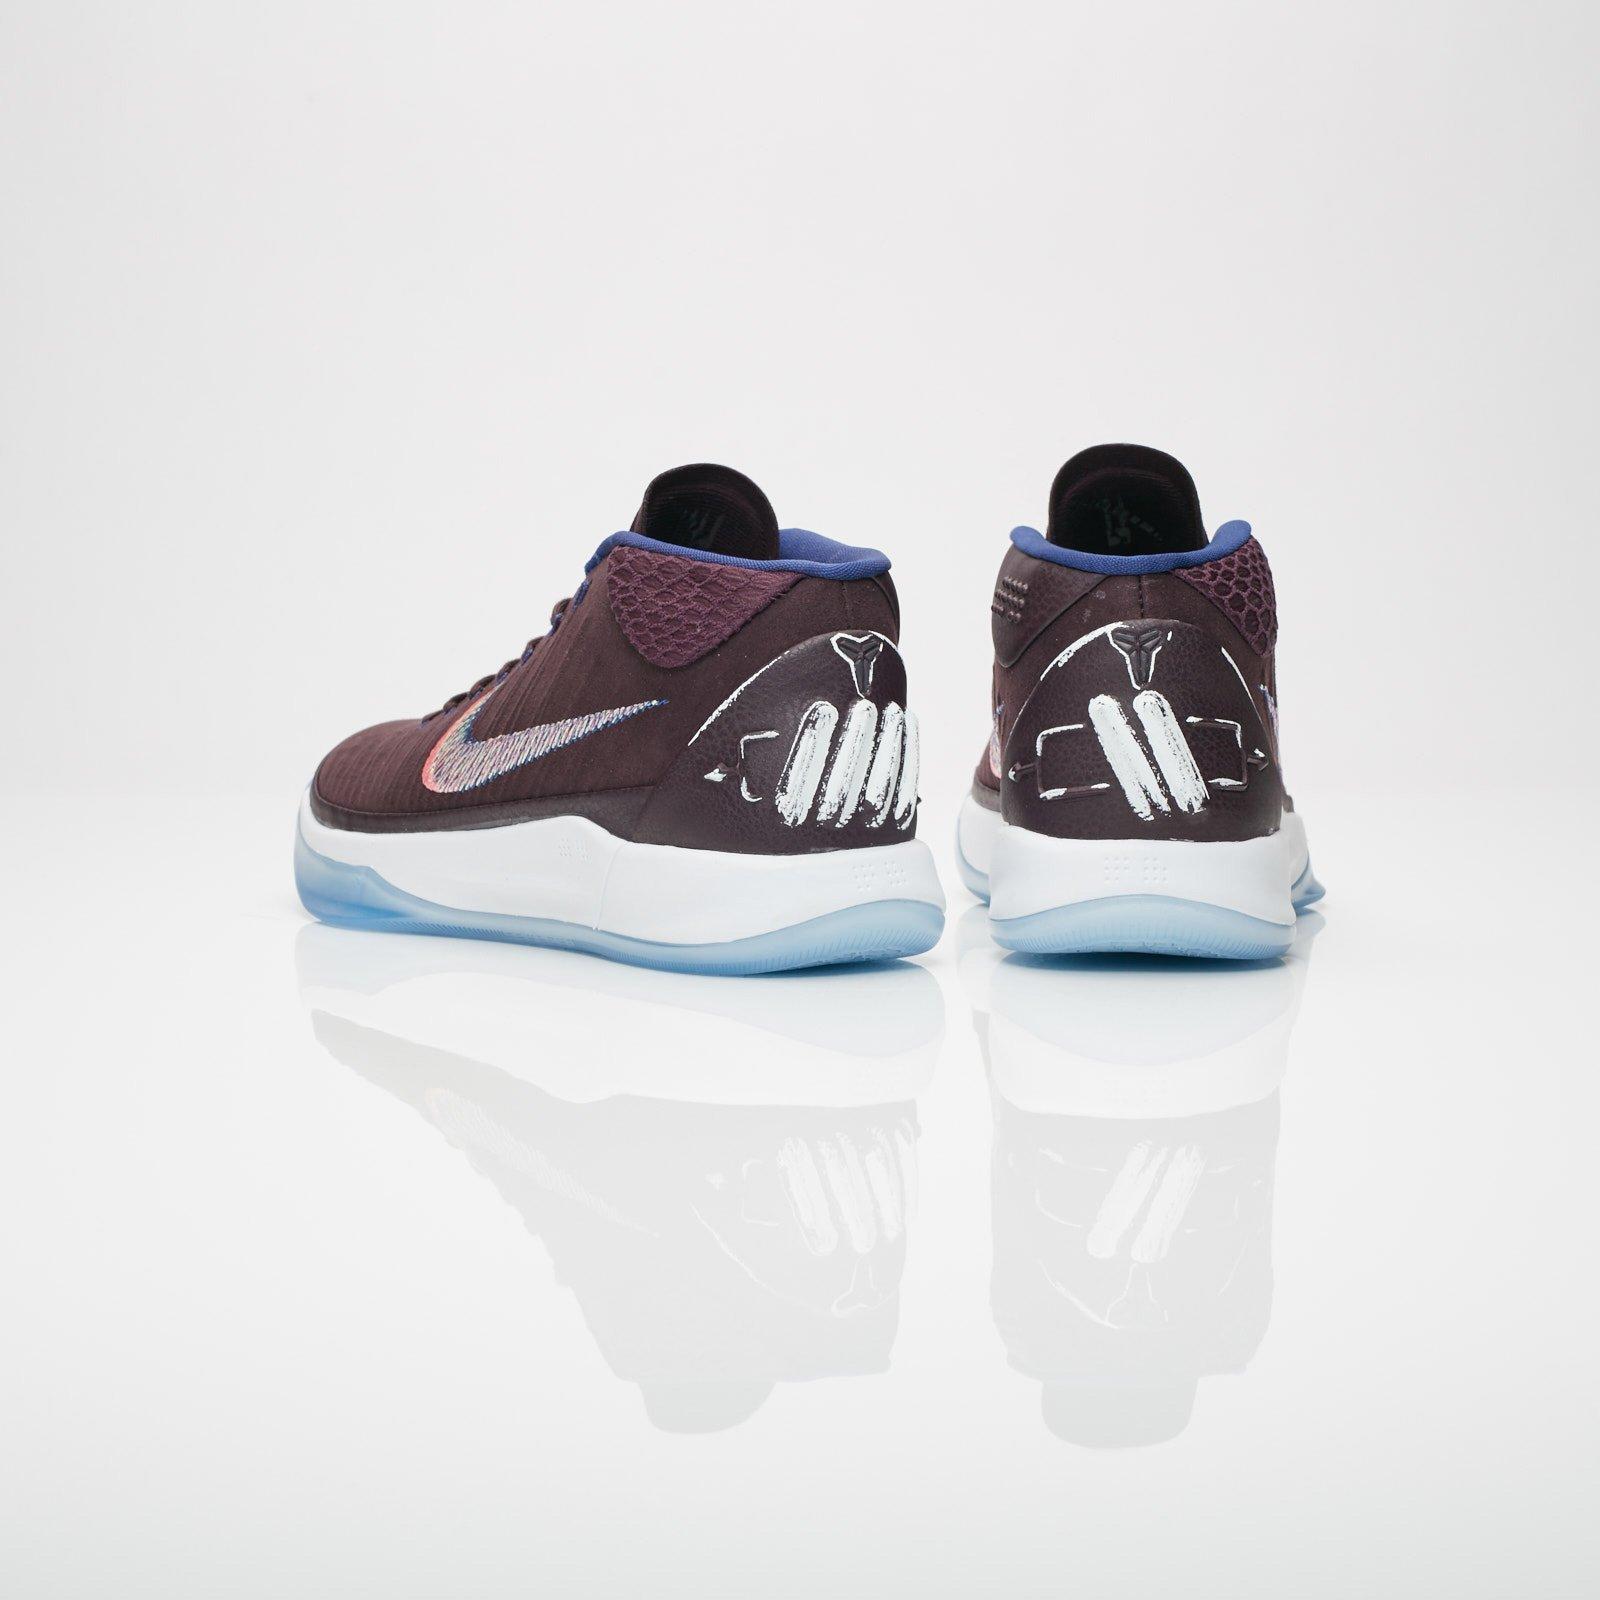 newest 99a2e 0b82b Nike Kobe AD - 922482-602 - Sneakersnstuff | sneakers ...